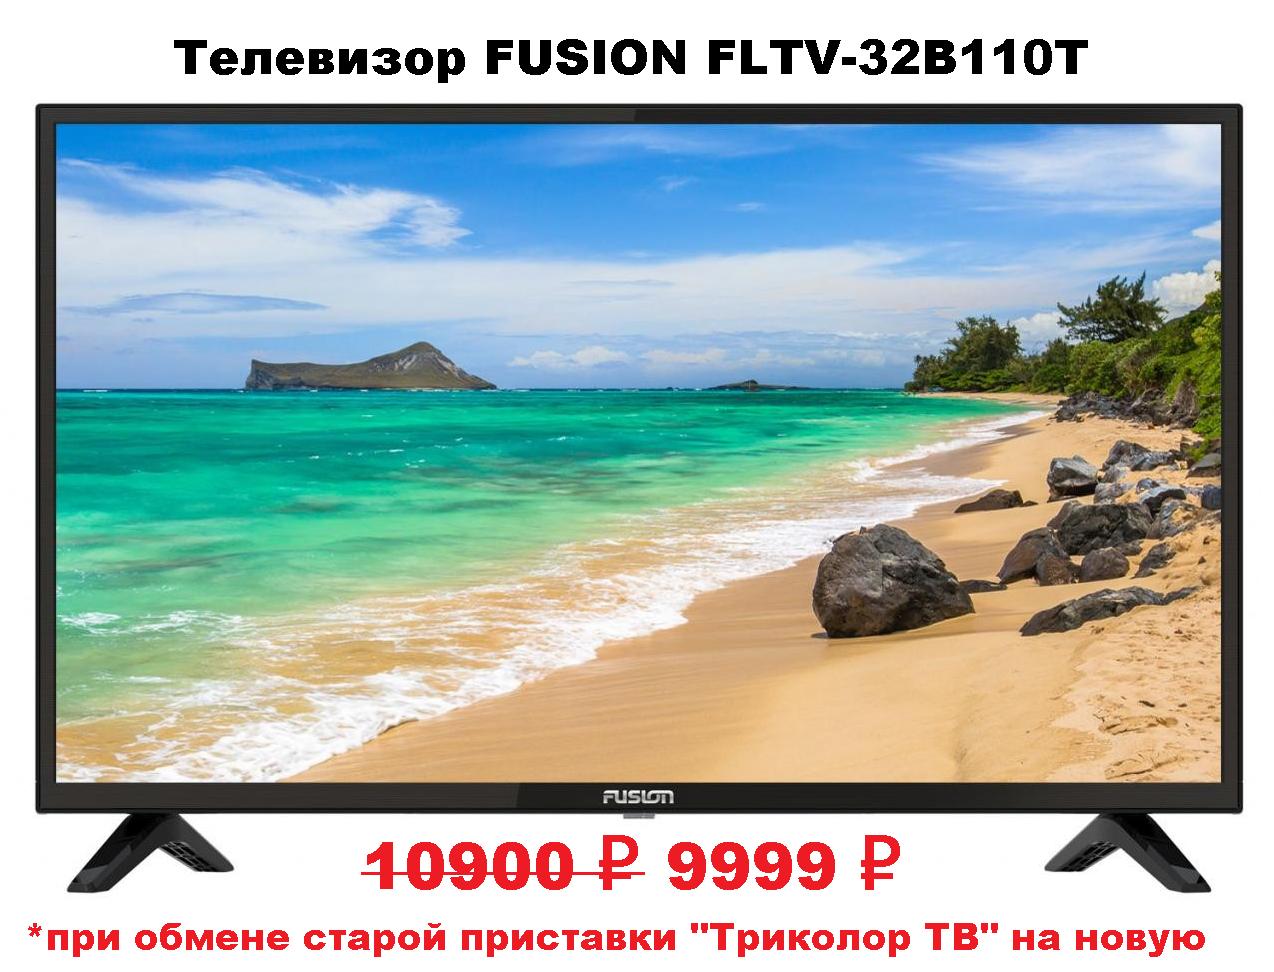 Телевизор_FUSION_FLTV-32B110T_акция